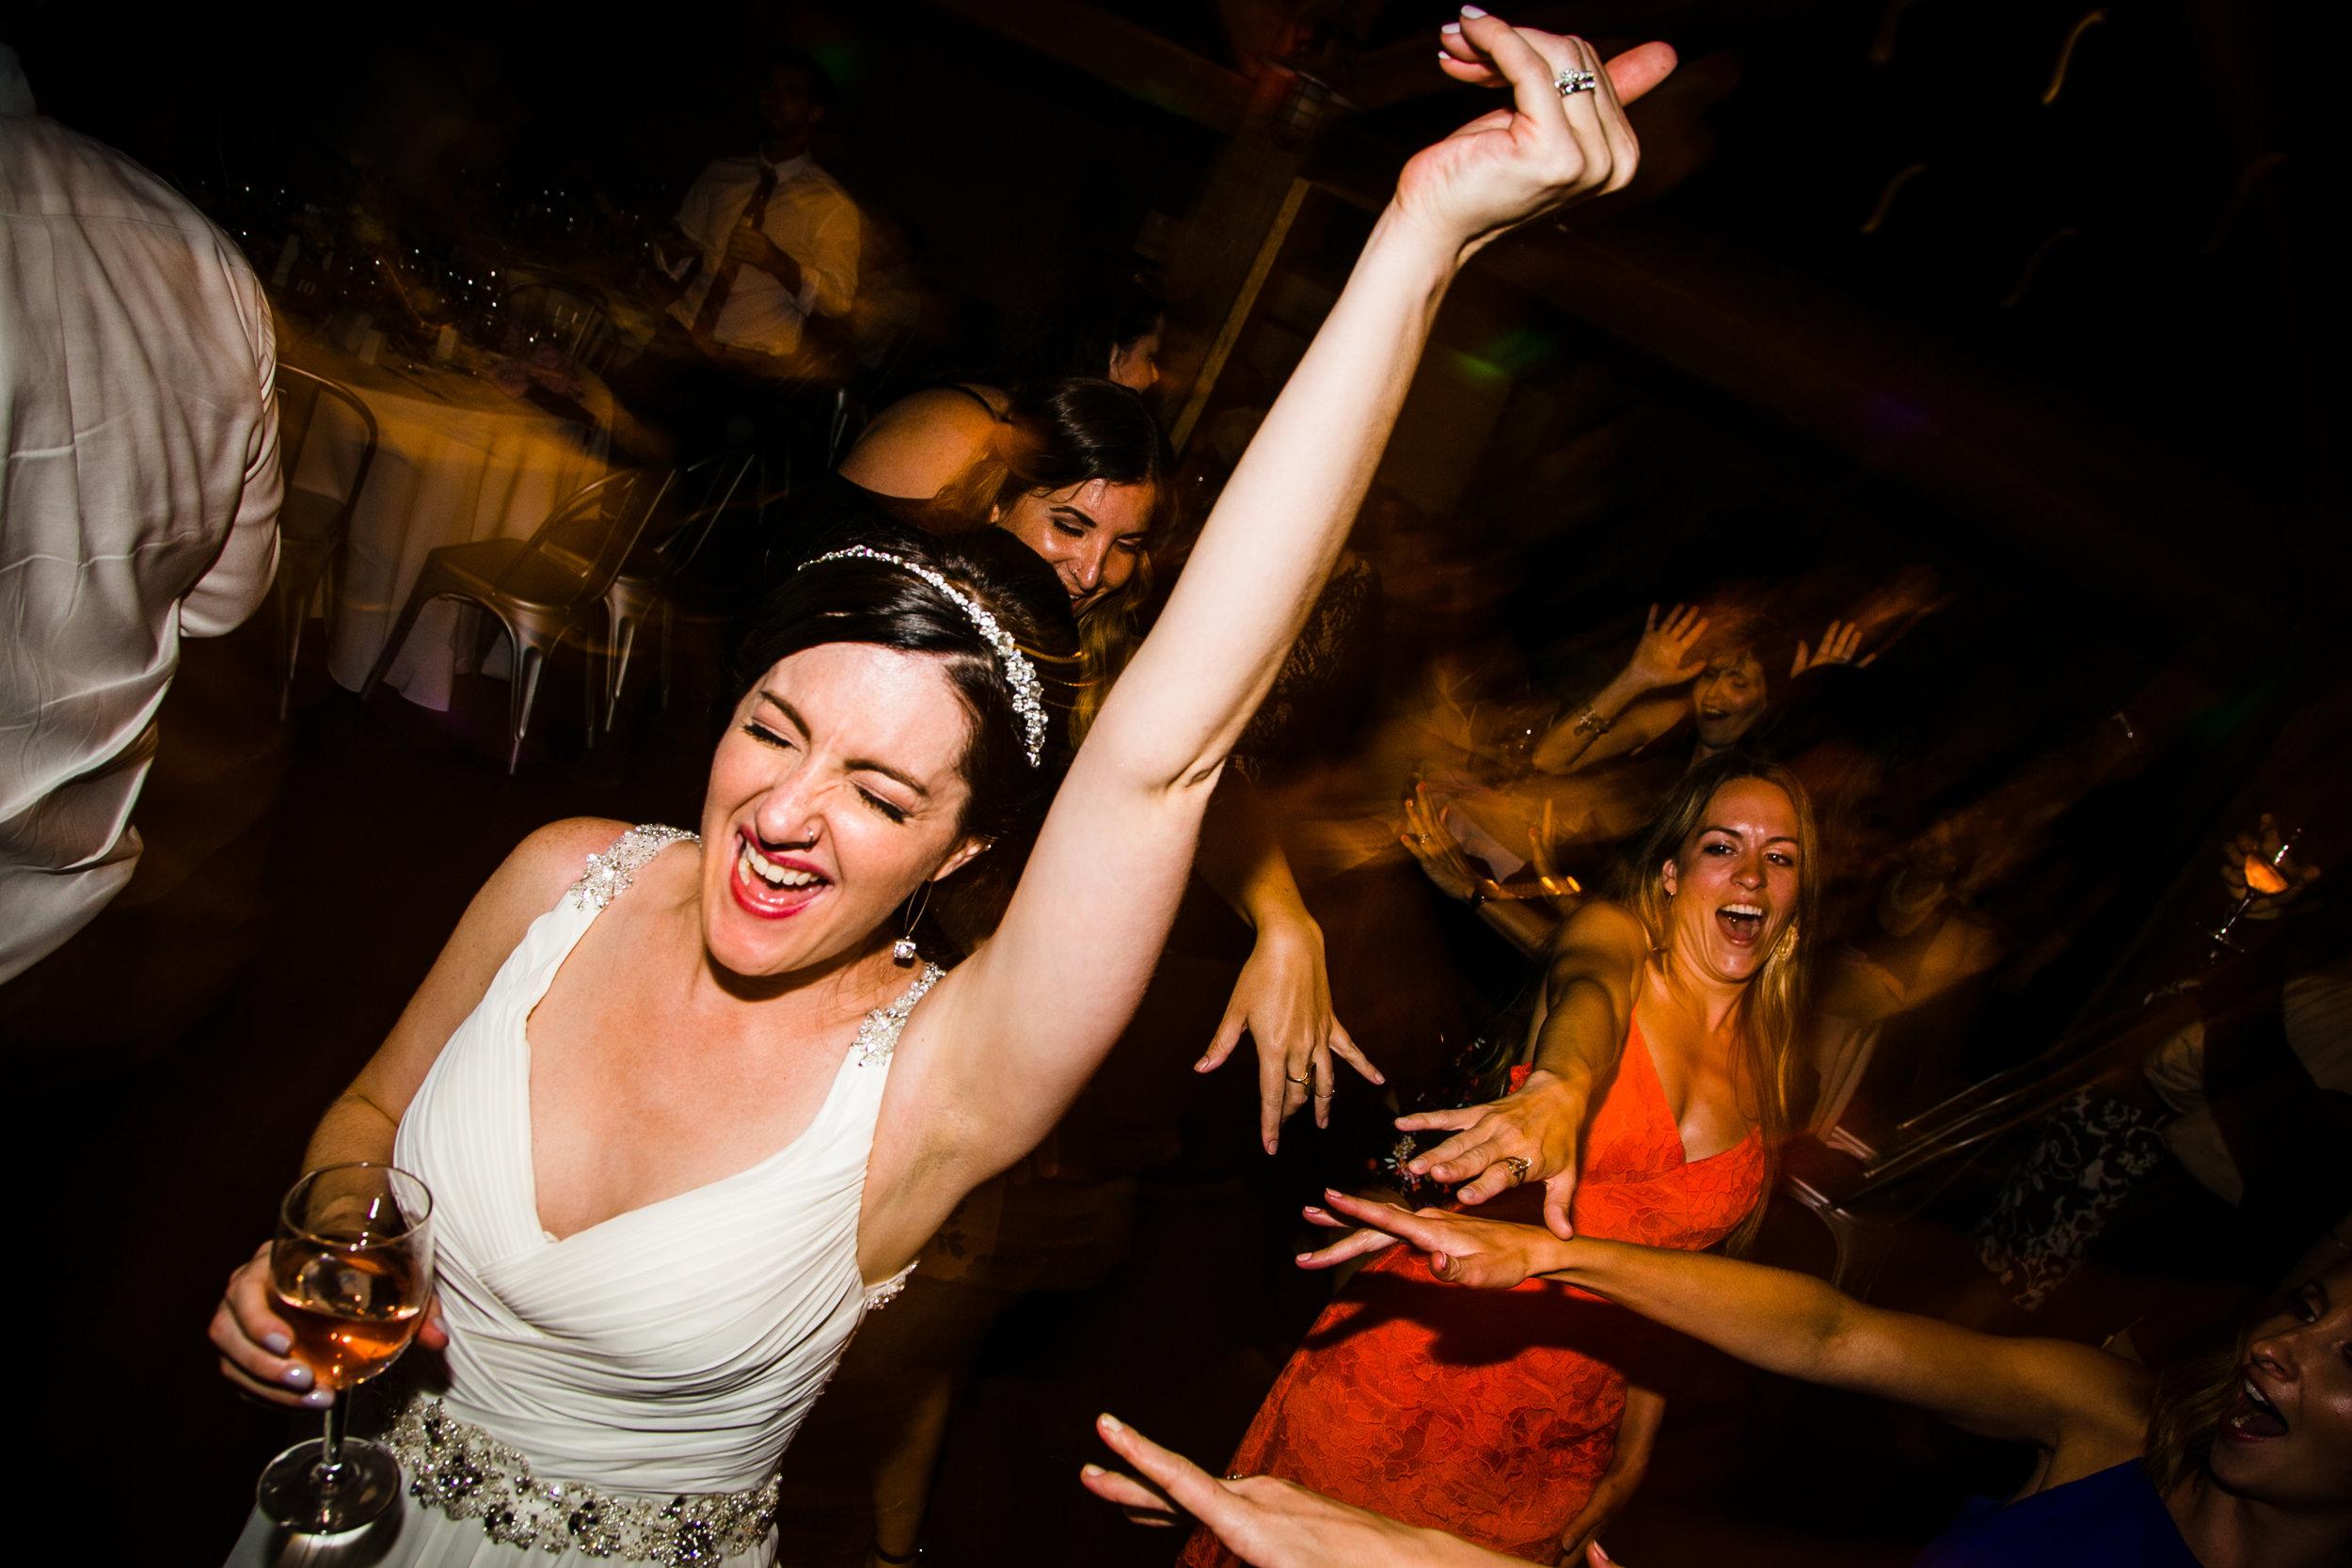 TYLER ARBORETUM WEDDING PHOTOGRAPHY LOVESTRUCK PICTURES-092.jpg